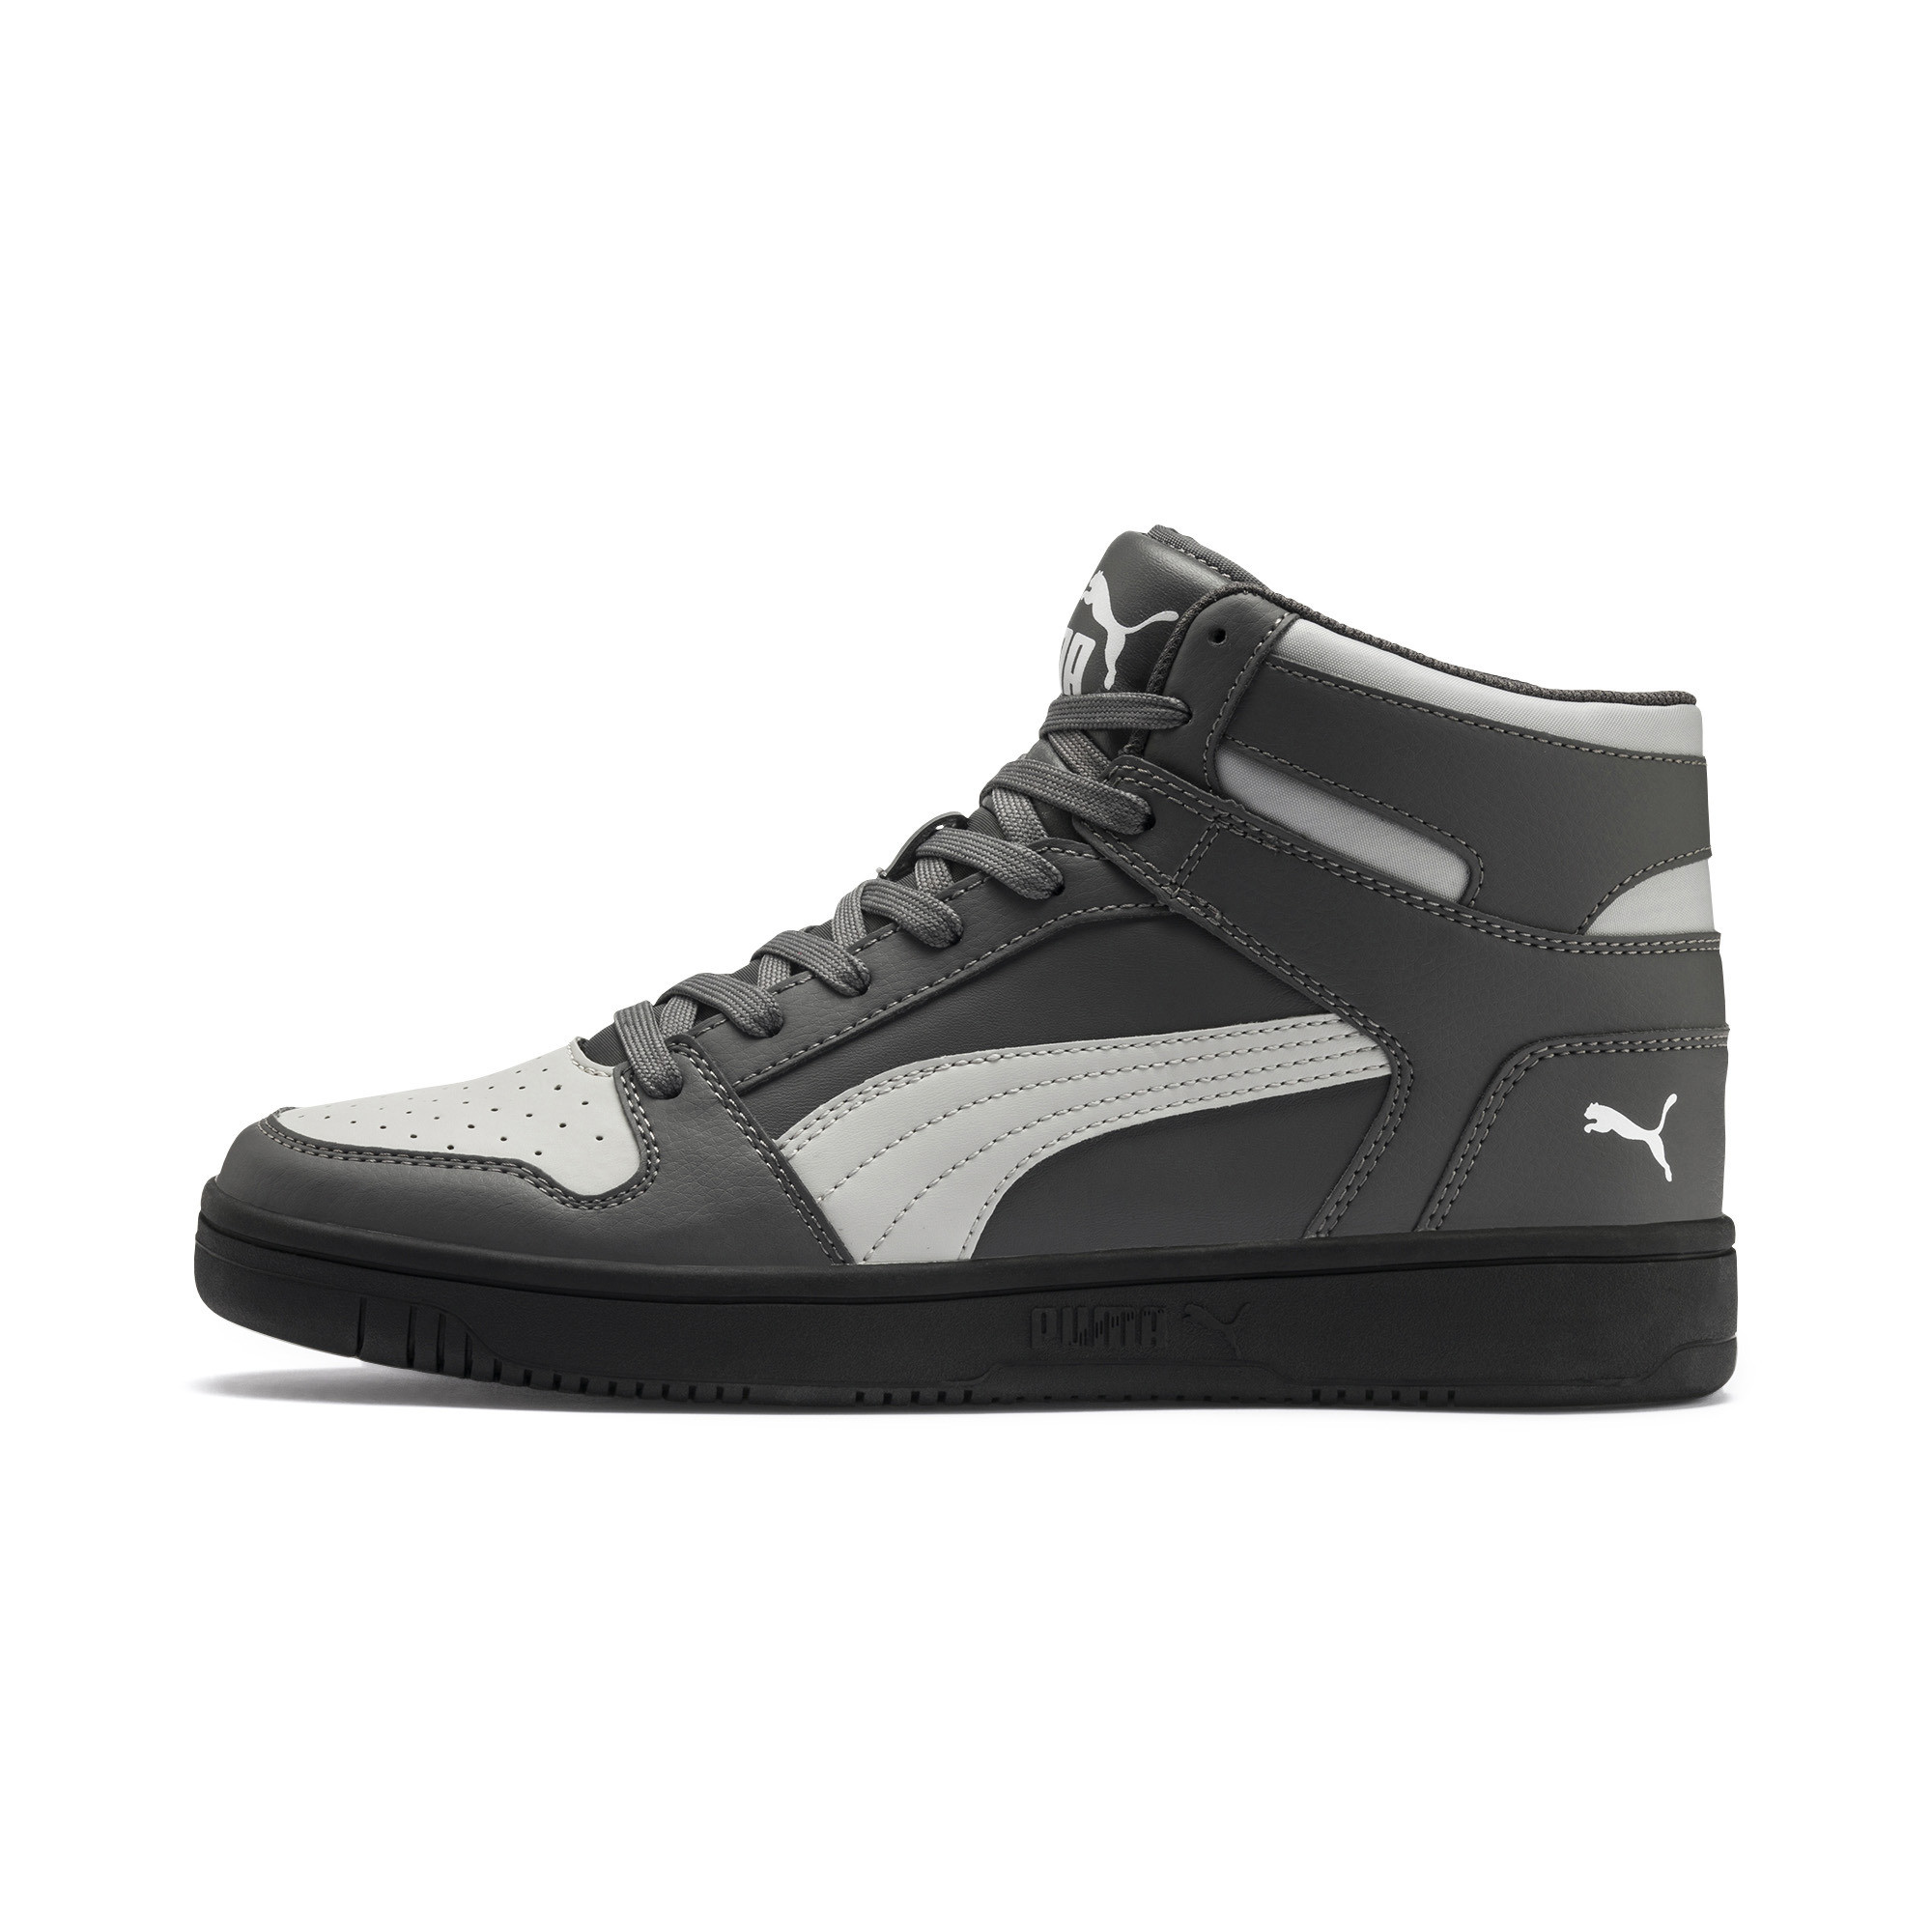 PUMA-PUMA-Rebound-LayUp-Men-039-s-Sneakers-Men-Mid-Boot-Basics thumbnail 14